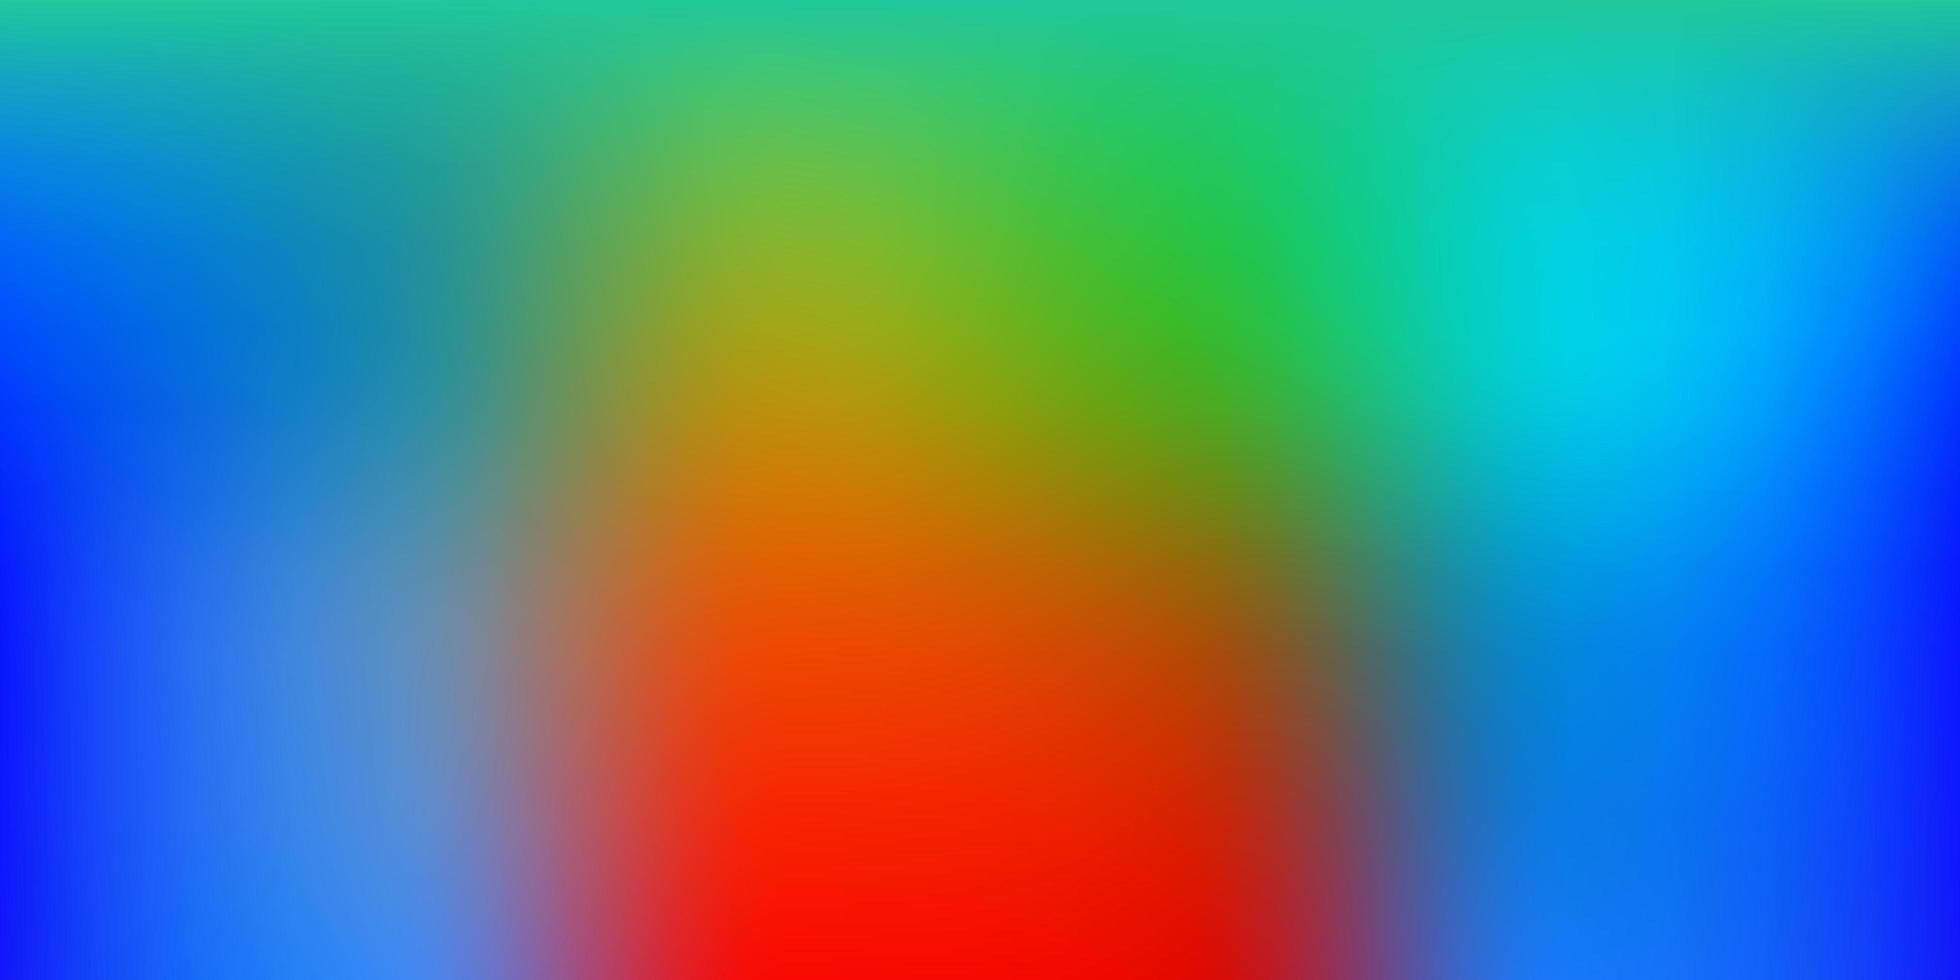 telón de fondo borroso vector multicolor claro.